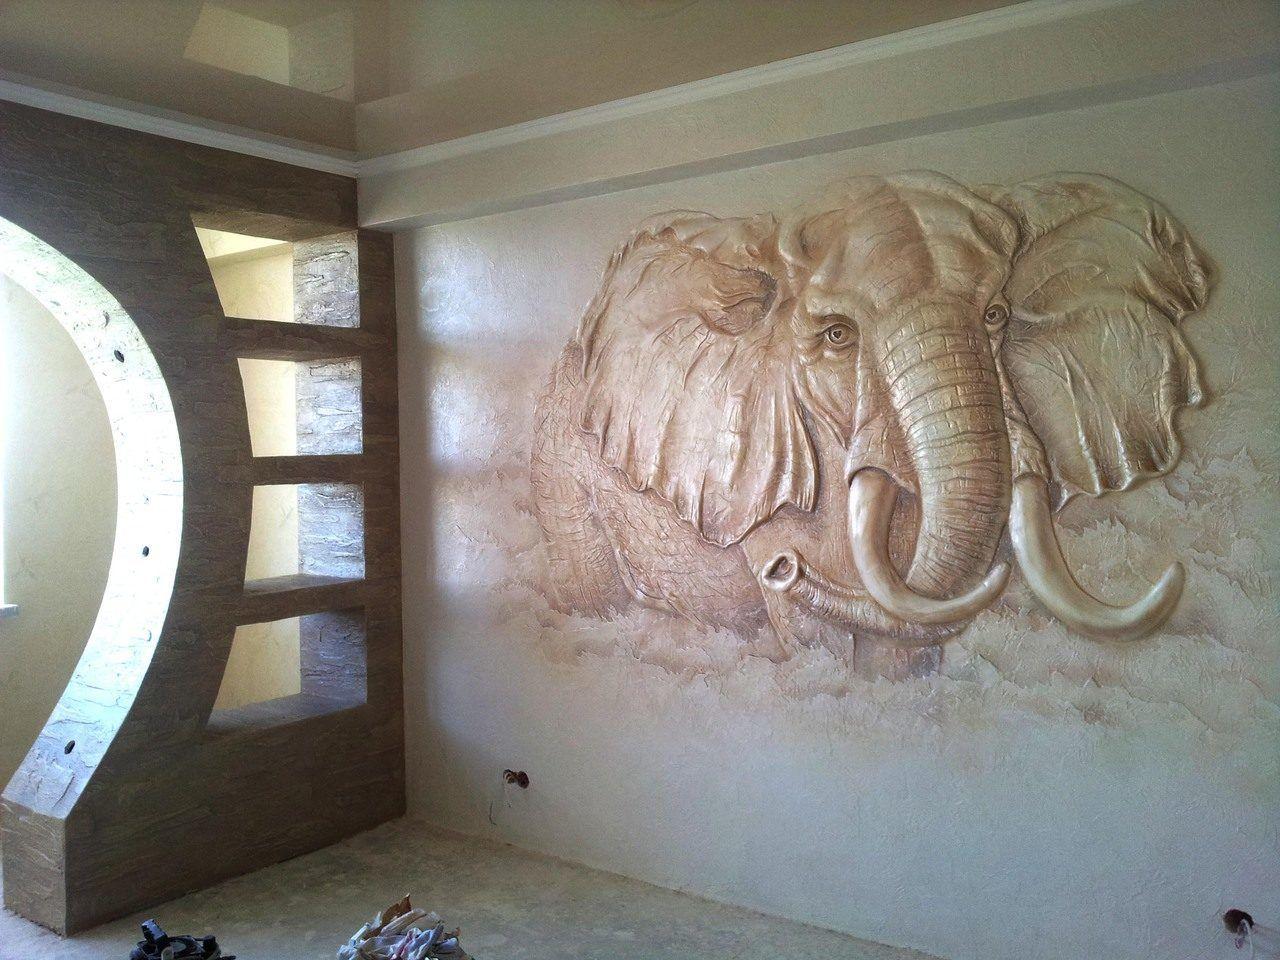 Pin de terri mazzola en plaster sculptures pinterest - Cuadros de escayola ...